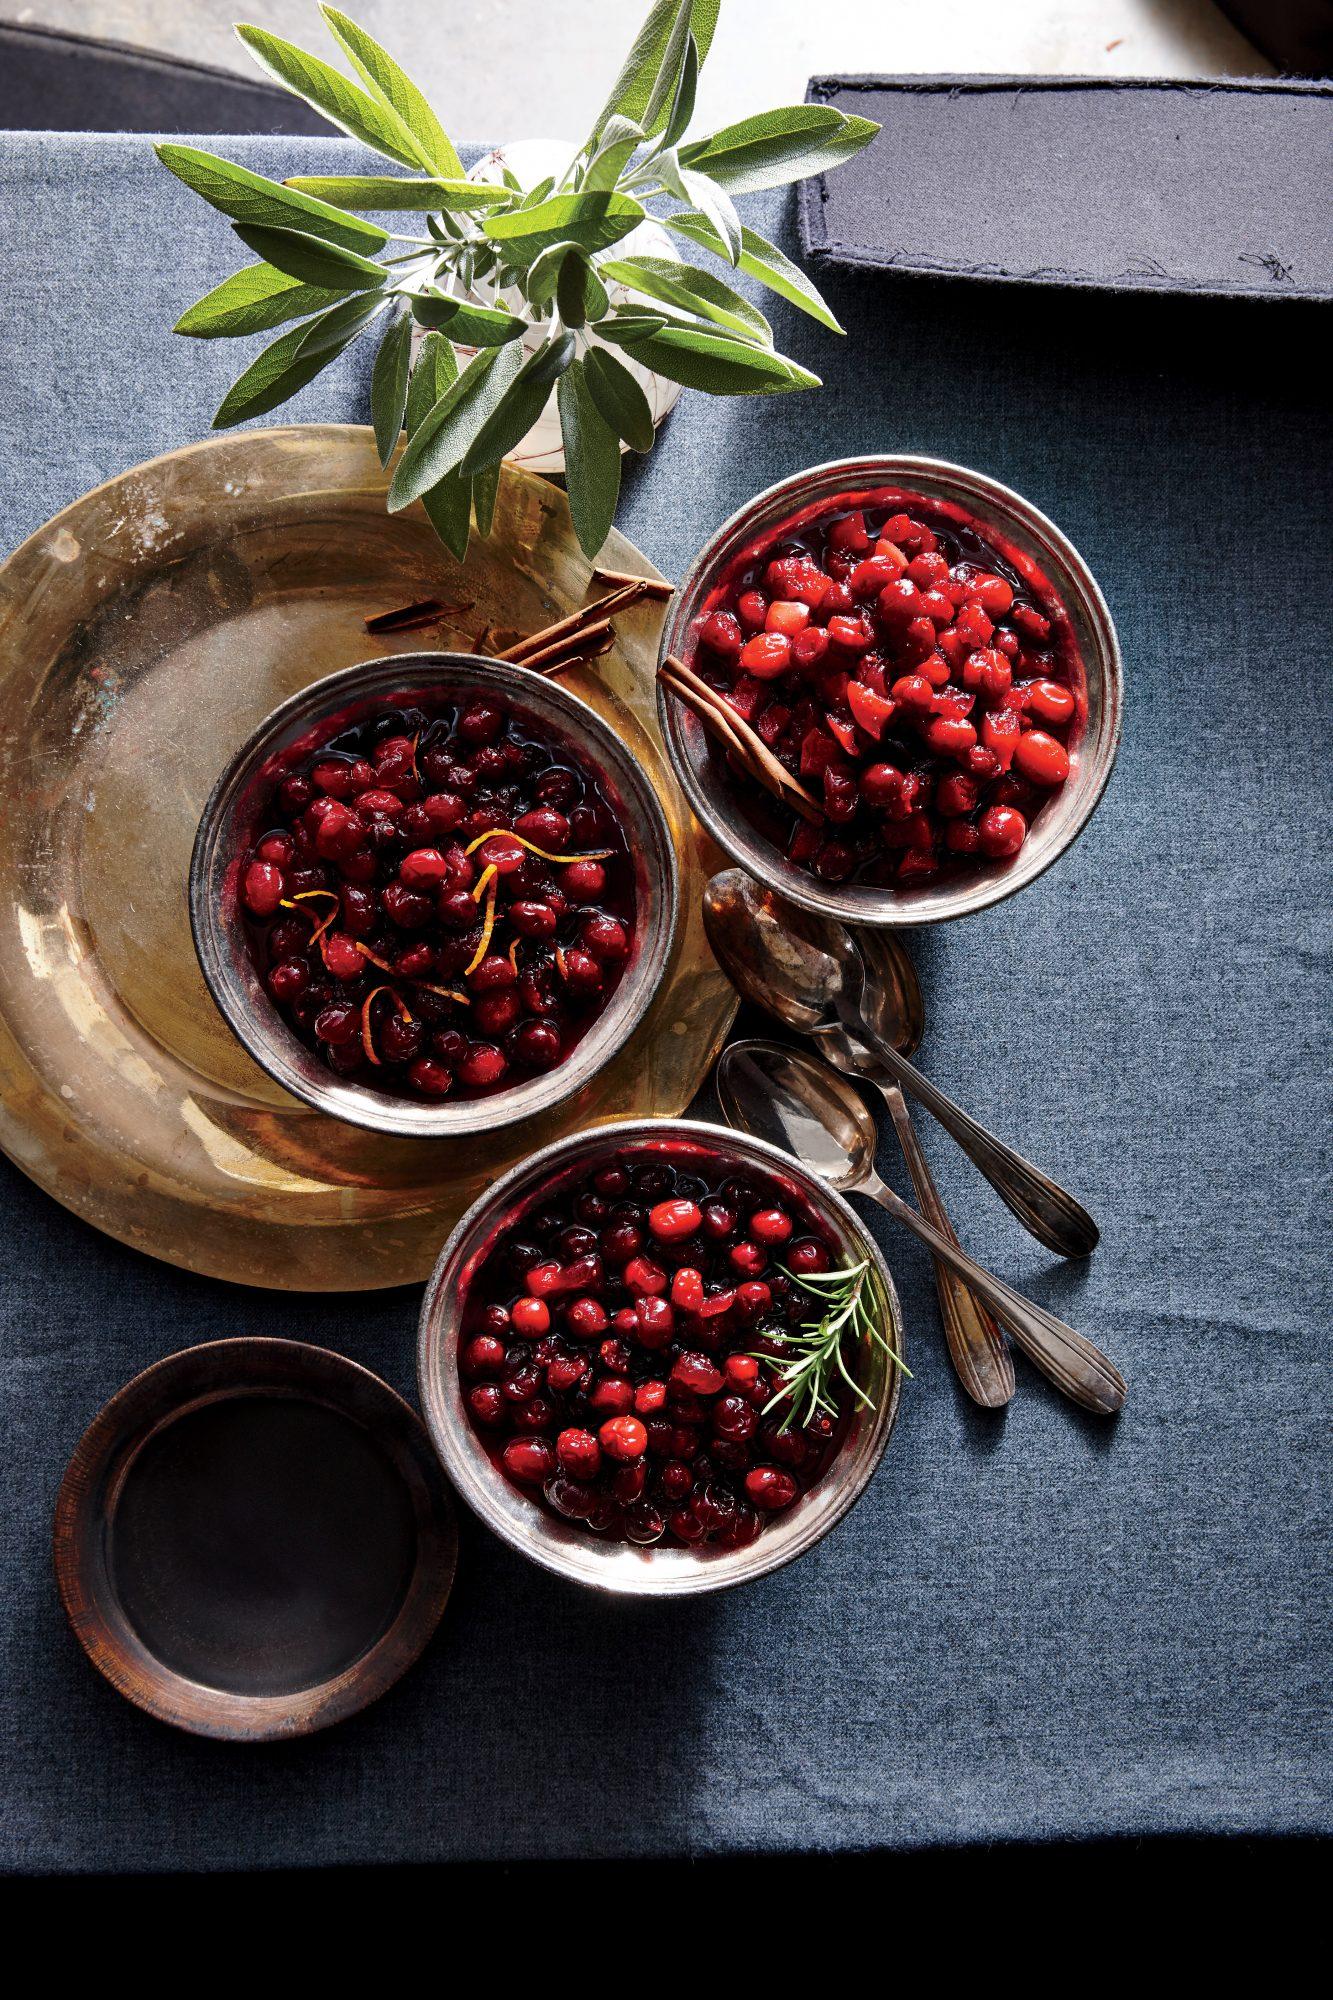 Spiced-Apple Cranberry Sauce